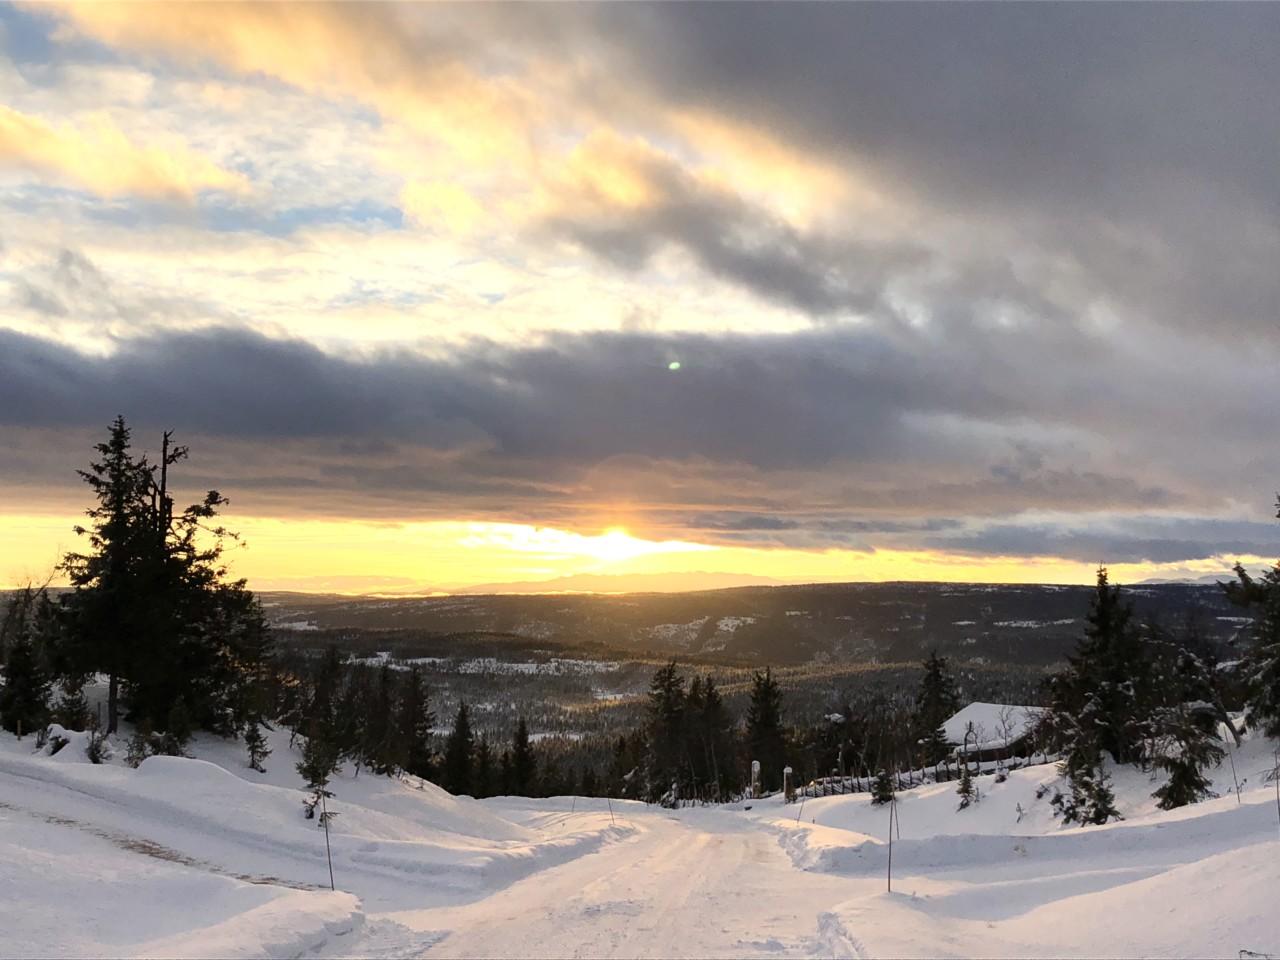 gausdal-skeikampen-sno-eventyrland-vinter